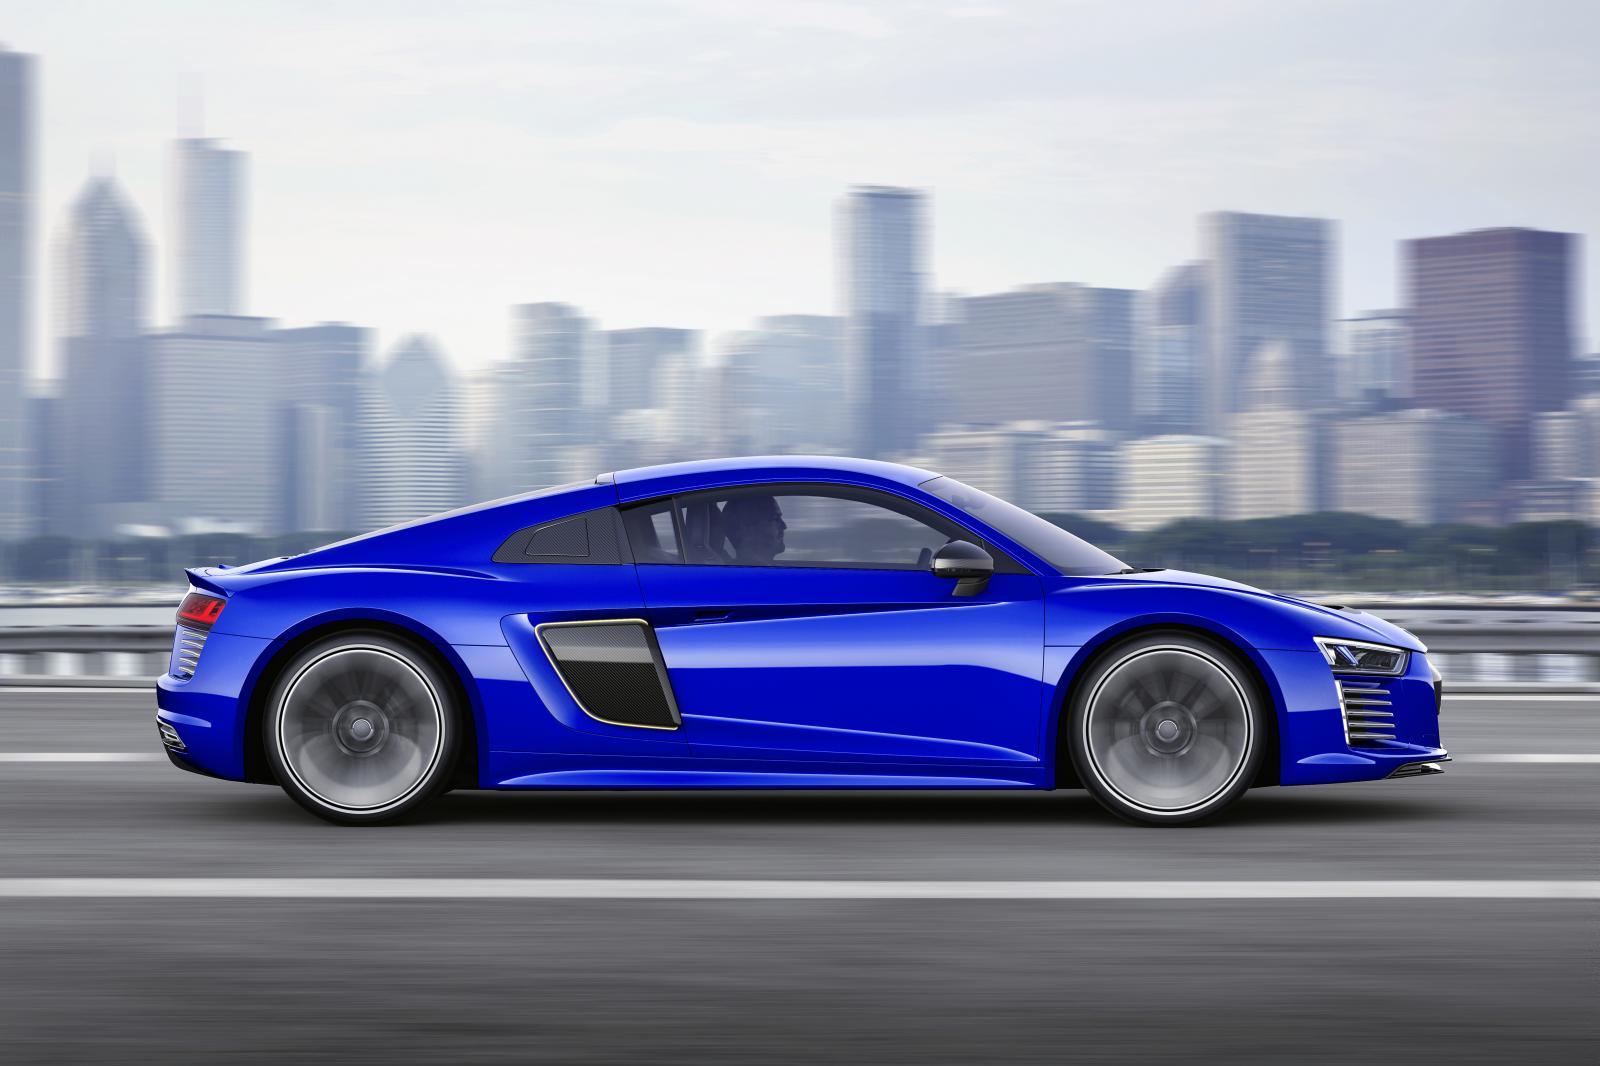 Audi R8 e-tron piloted driving concept